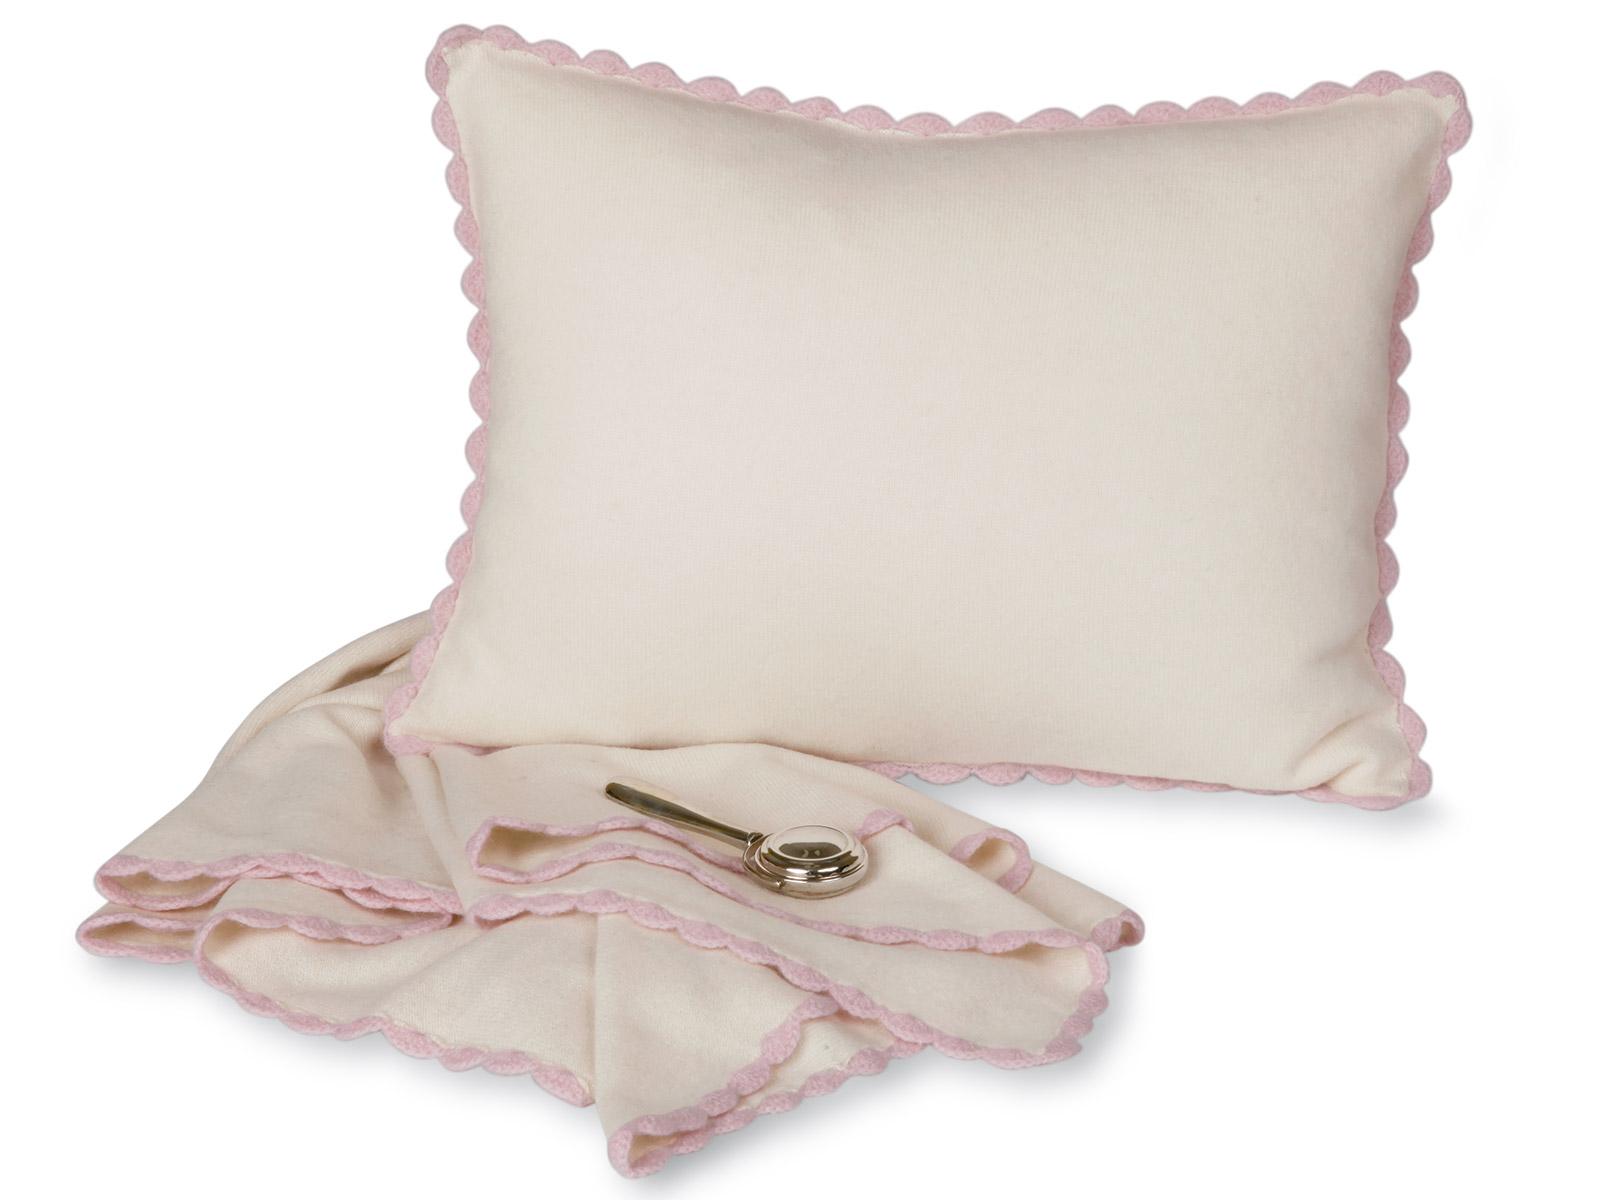 31a4a641e0 Baby s Cashmere - Luxury Bedding - Italian Bed Linens - Schweitzer Linen